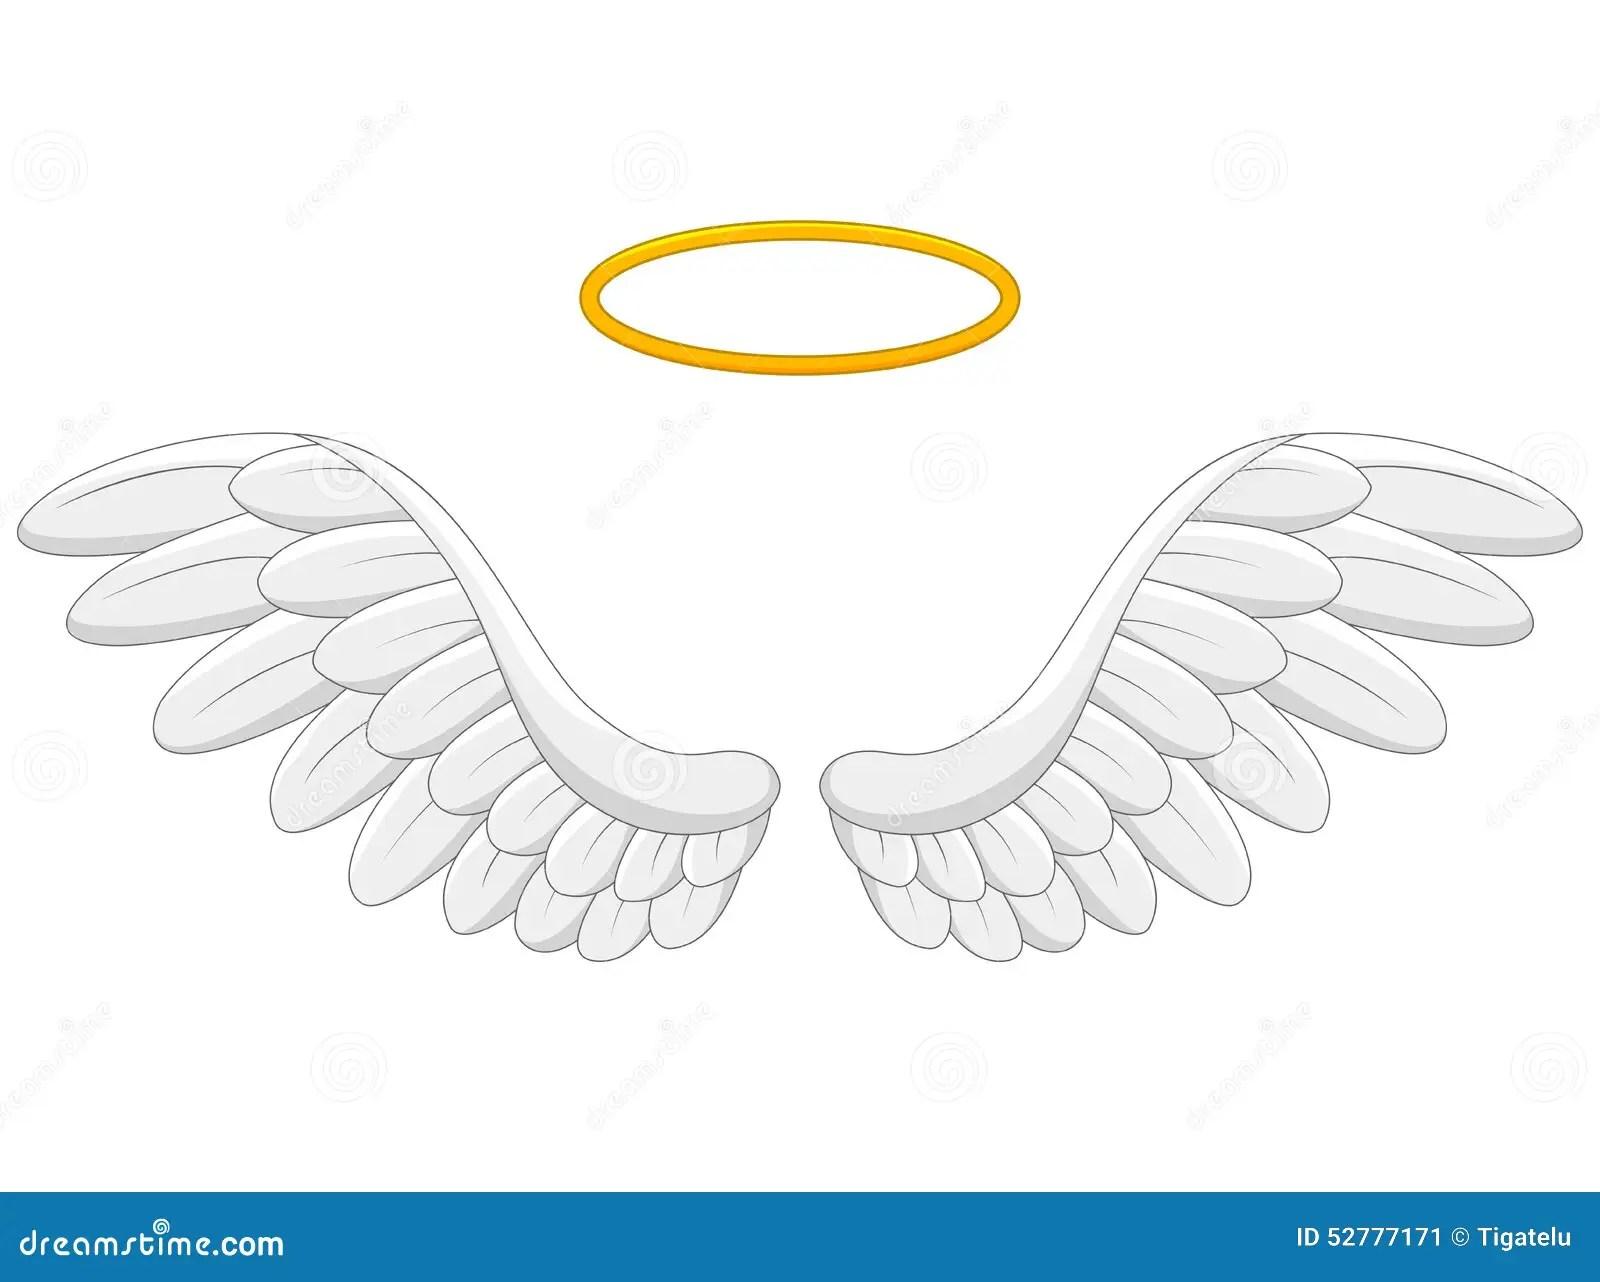 Angel Wings Cartoon Stock Vector Illustration Of Doodle